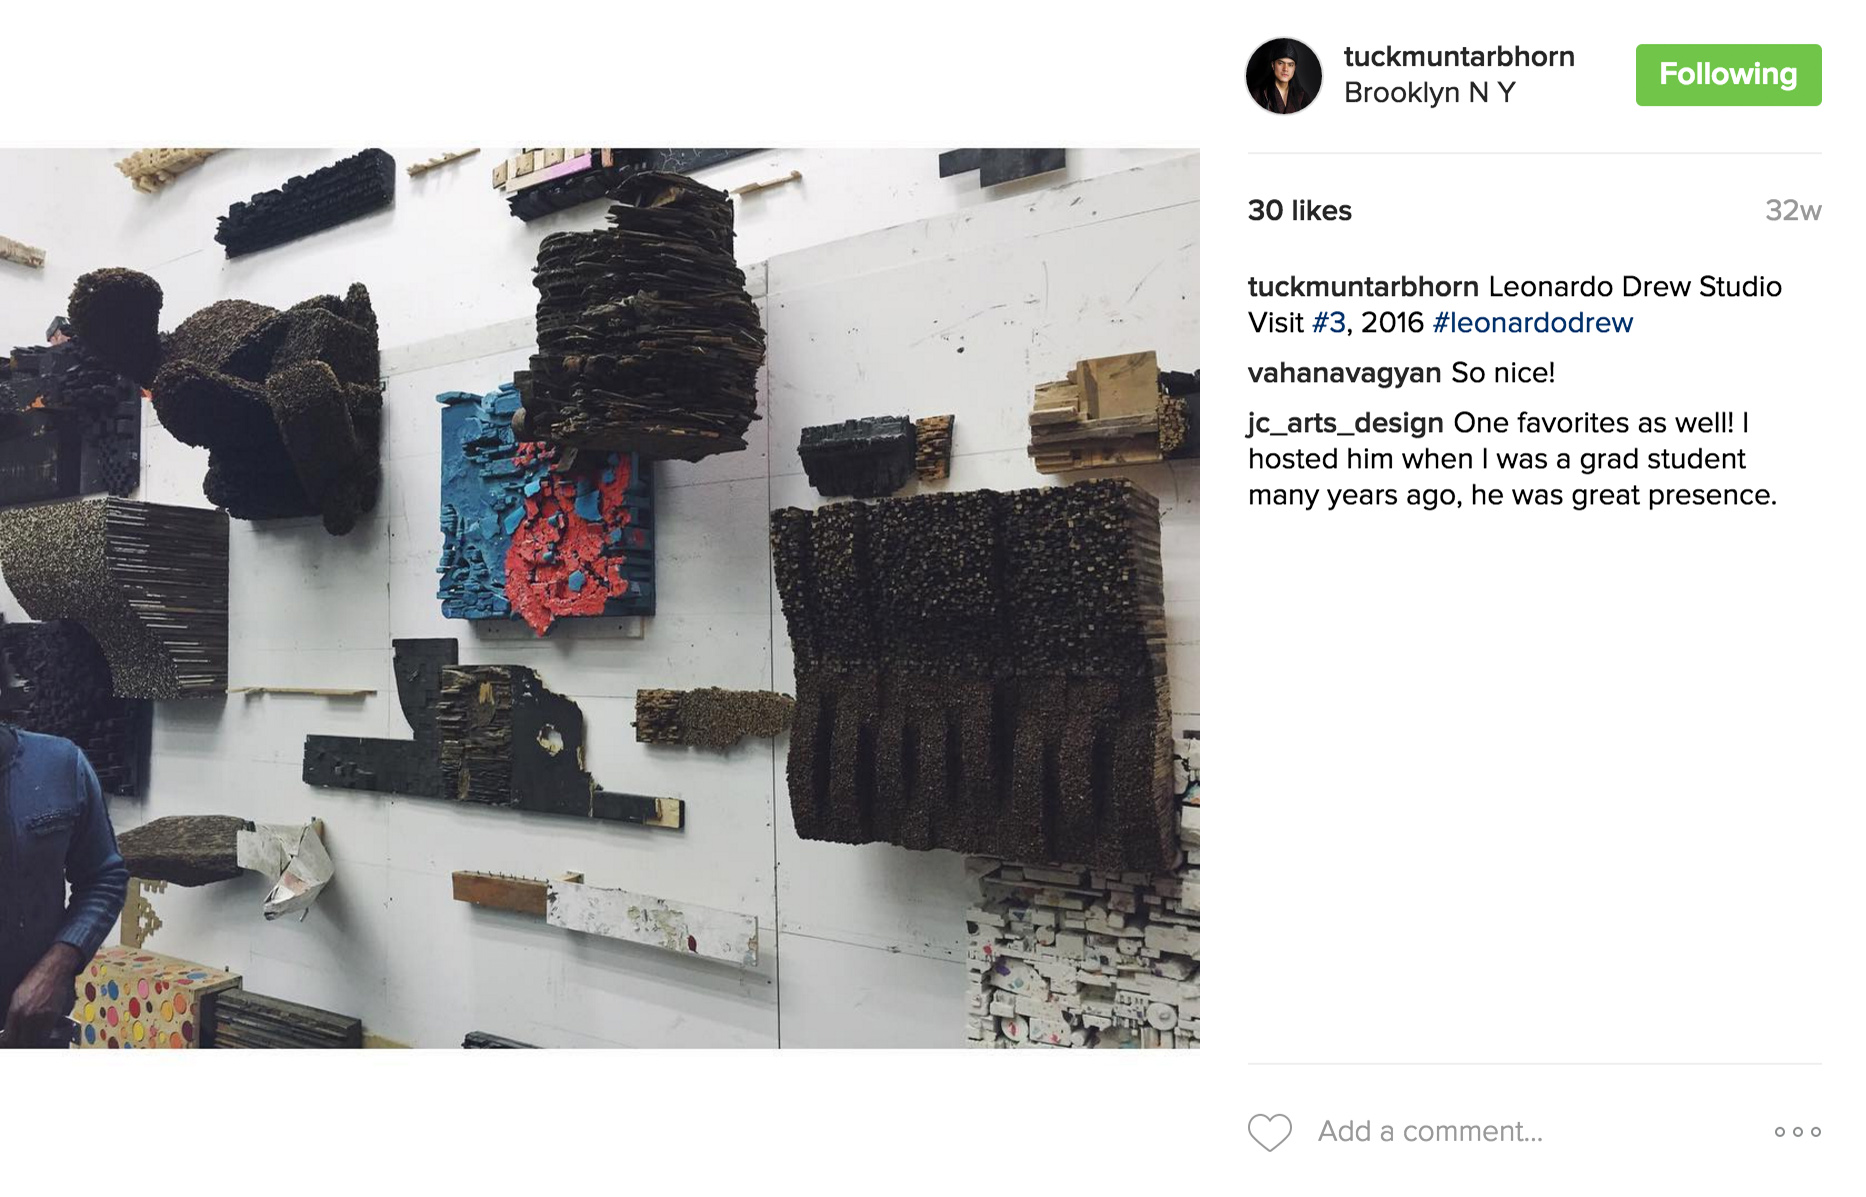 Leonardo Drew Studio Visit #3, 2016.jpg